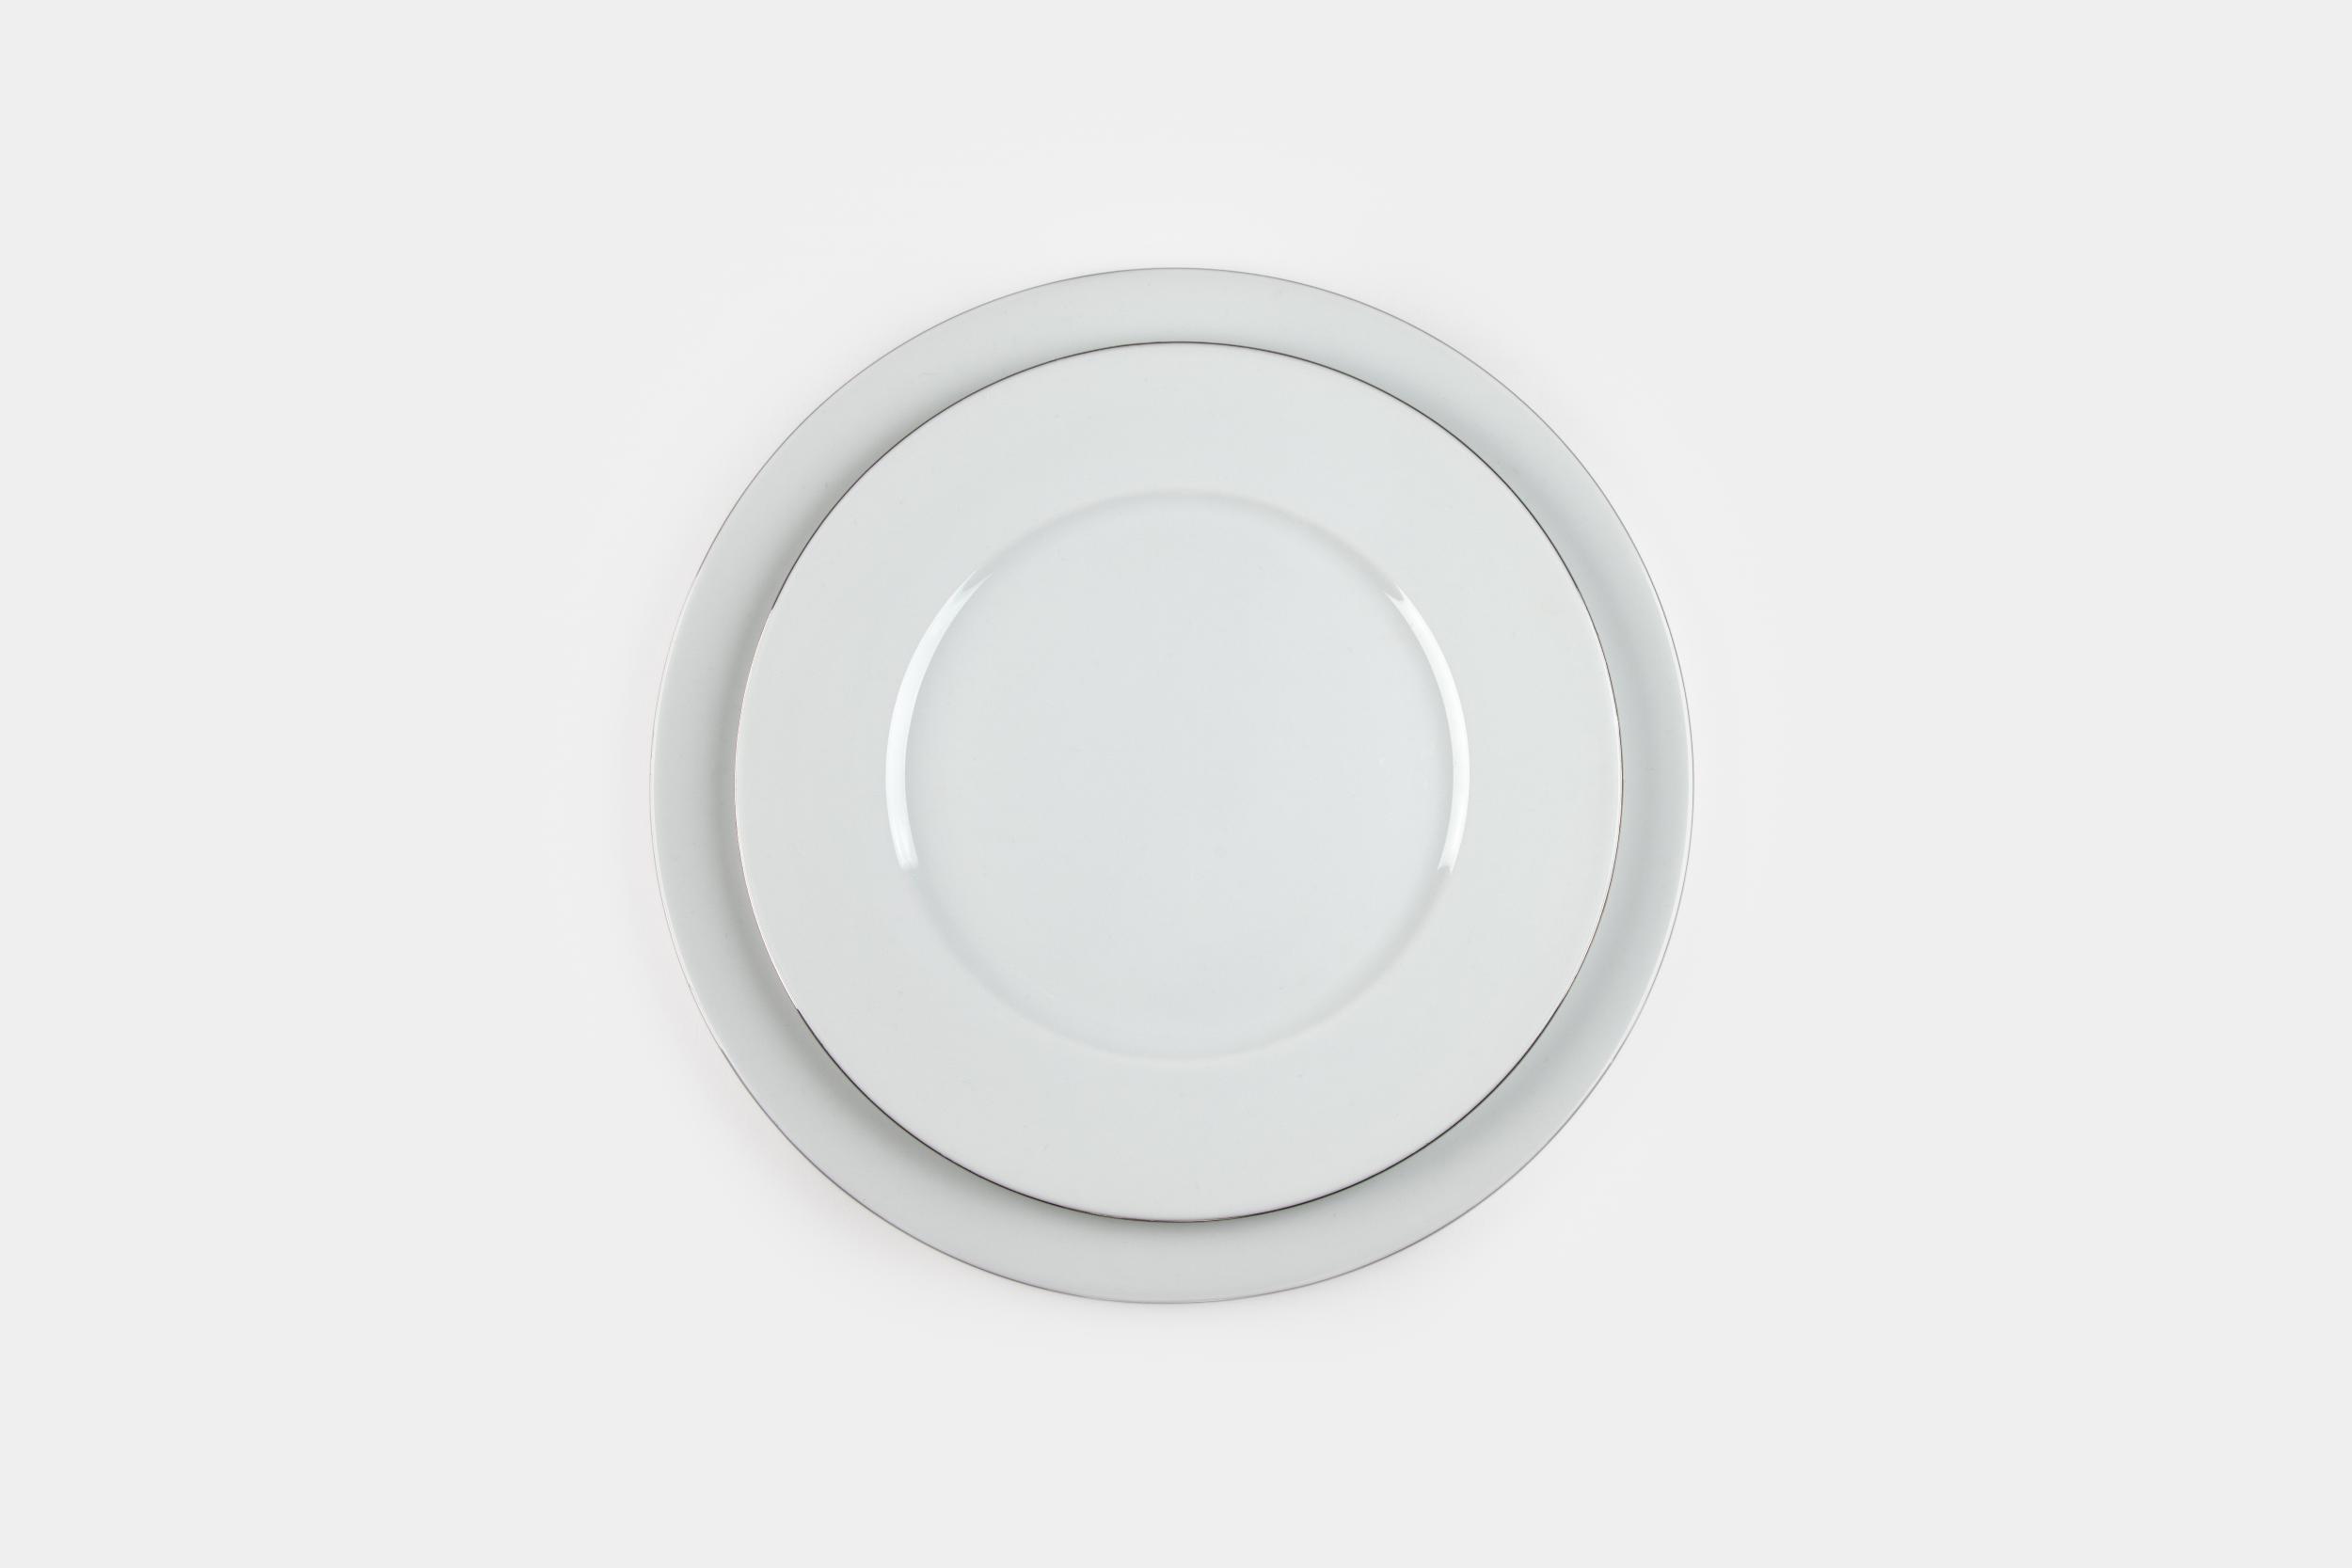 Platine plate set - Image 1